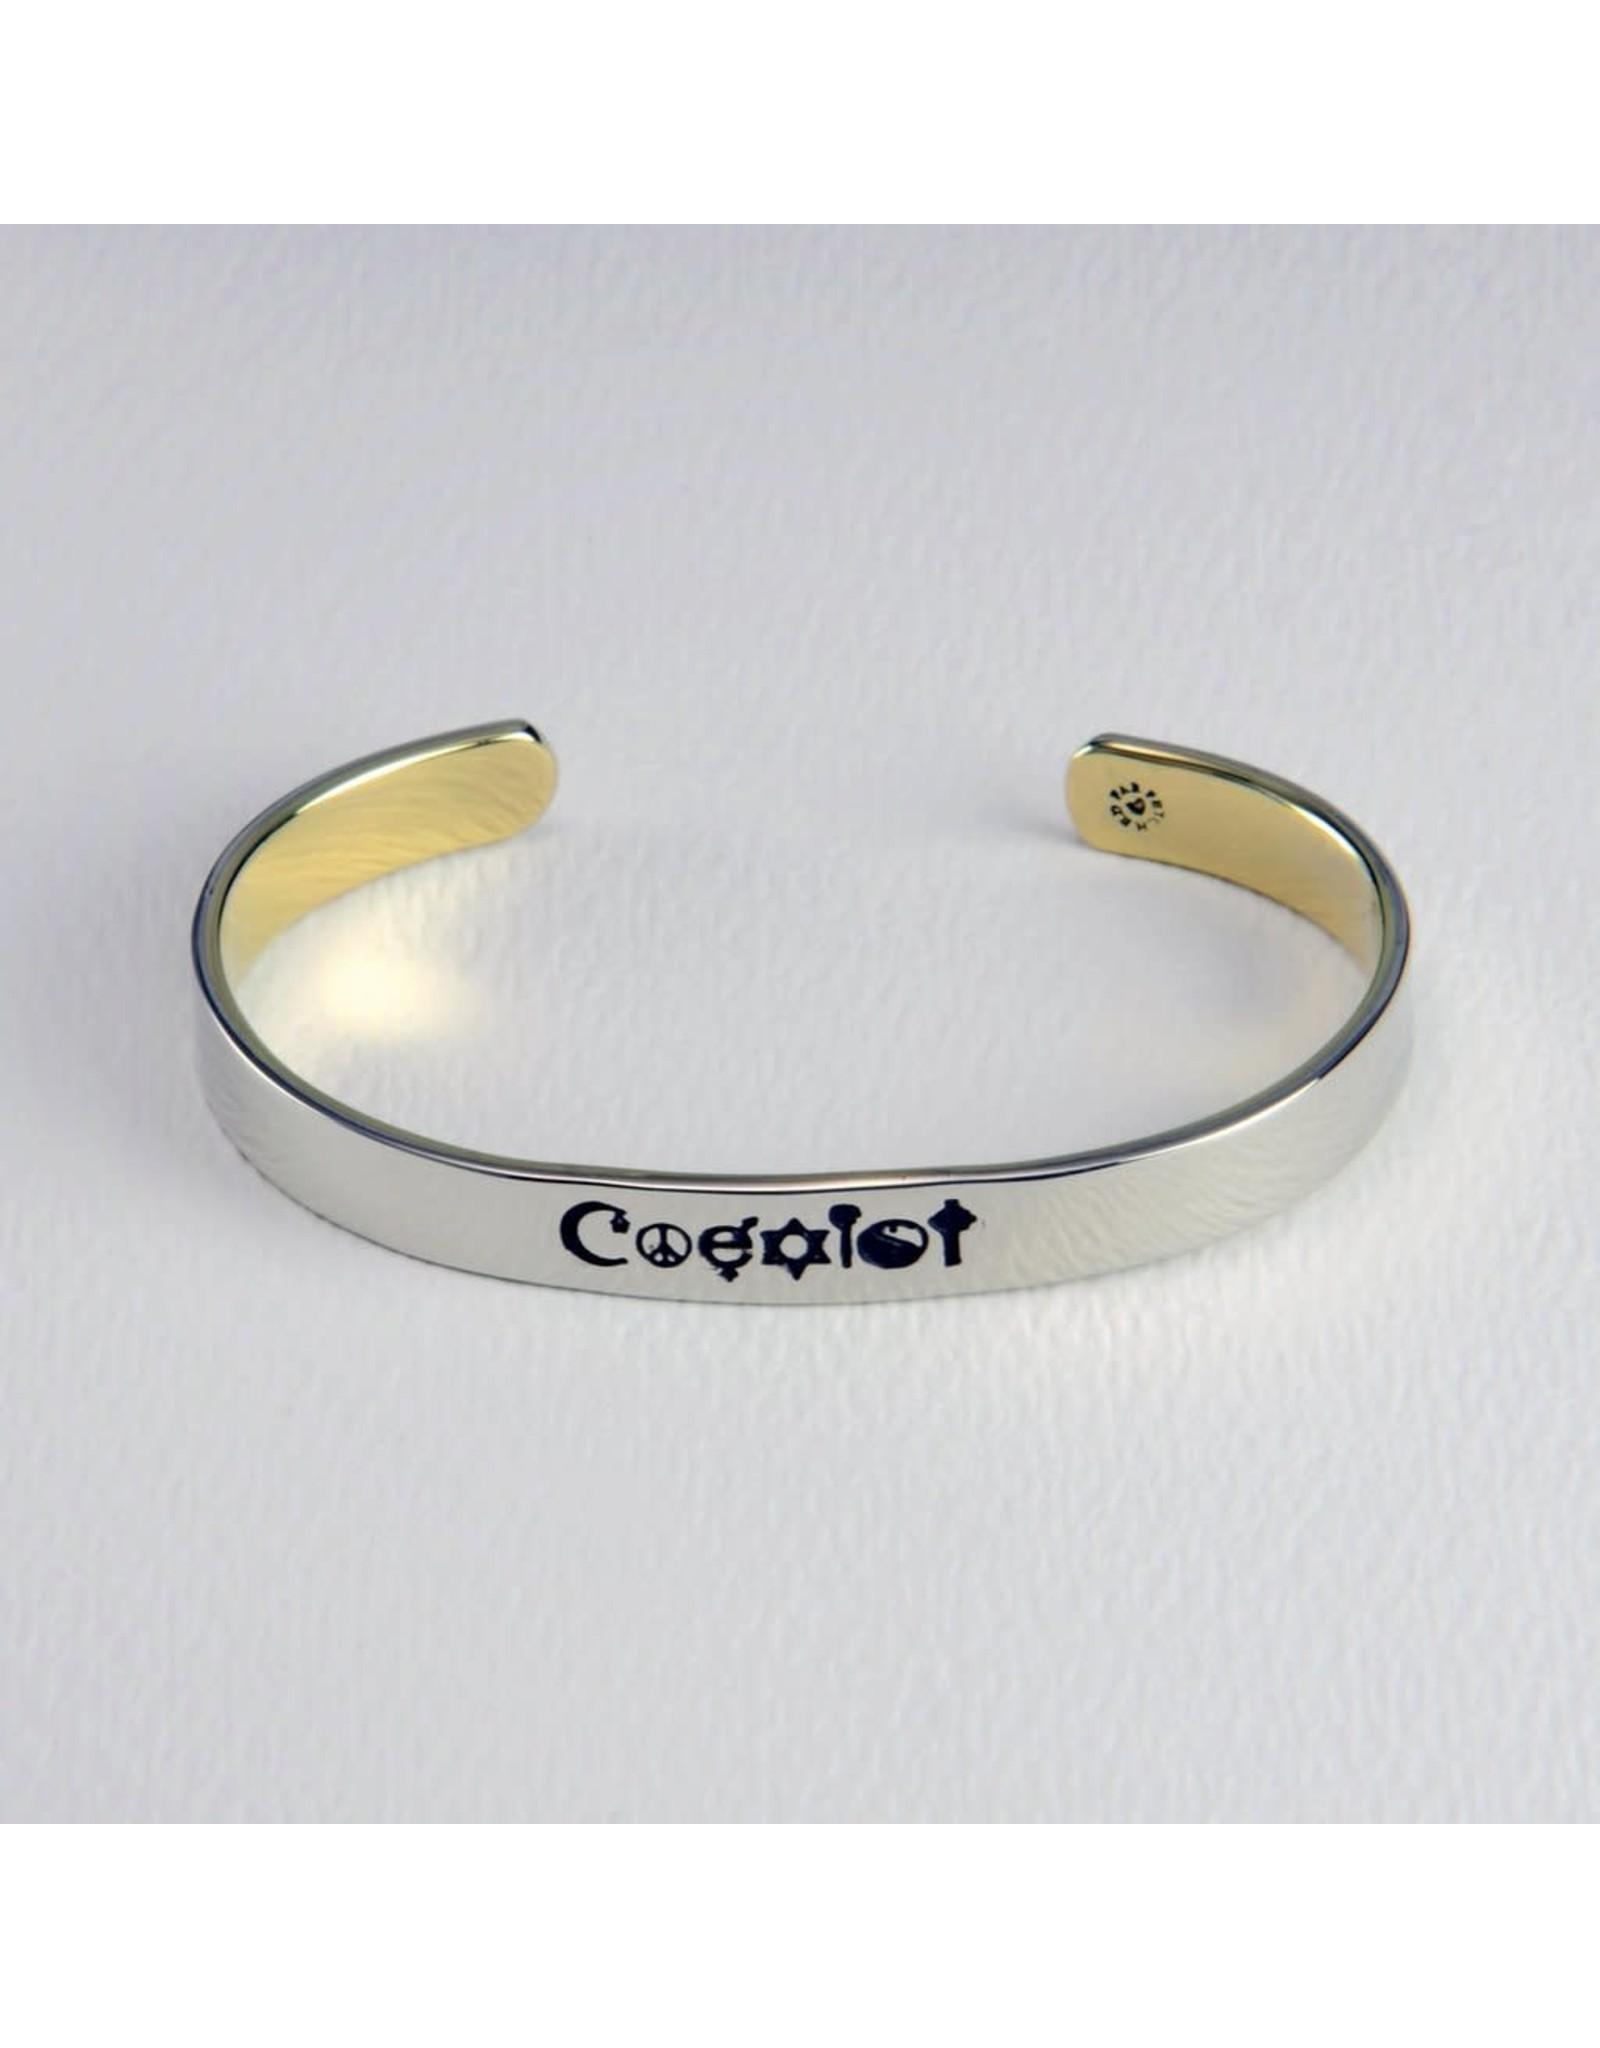 Coexist Cuff Bracelet, Mexico